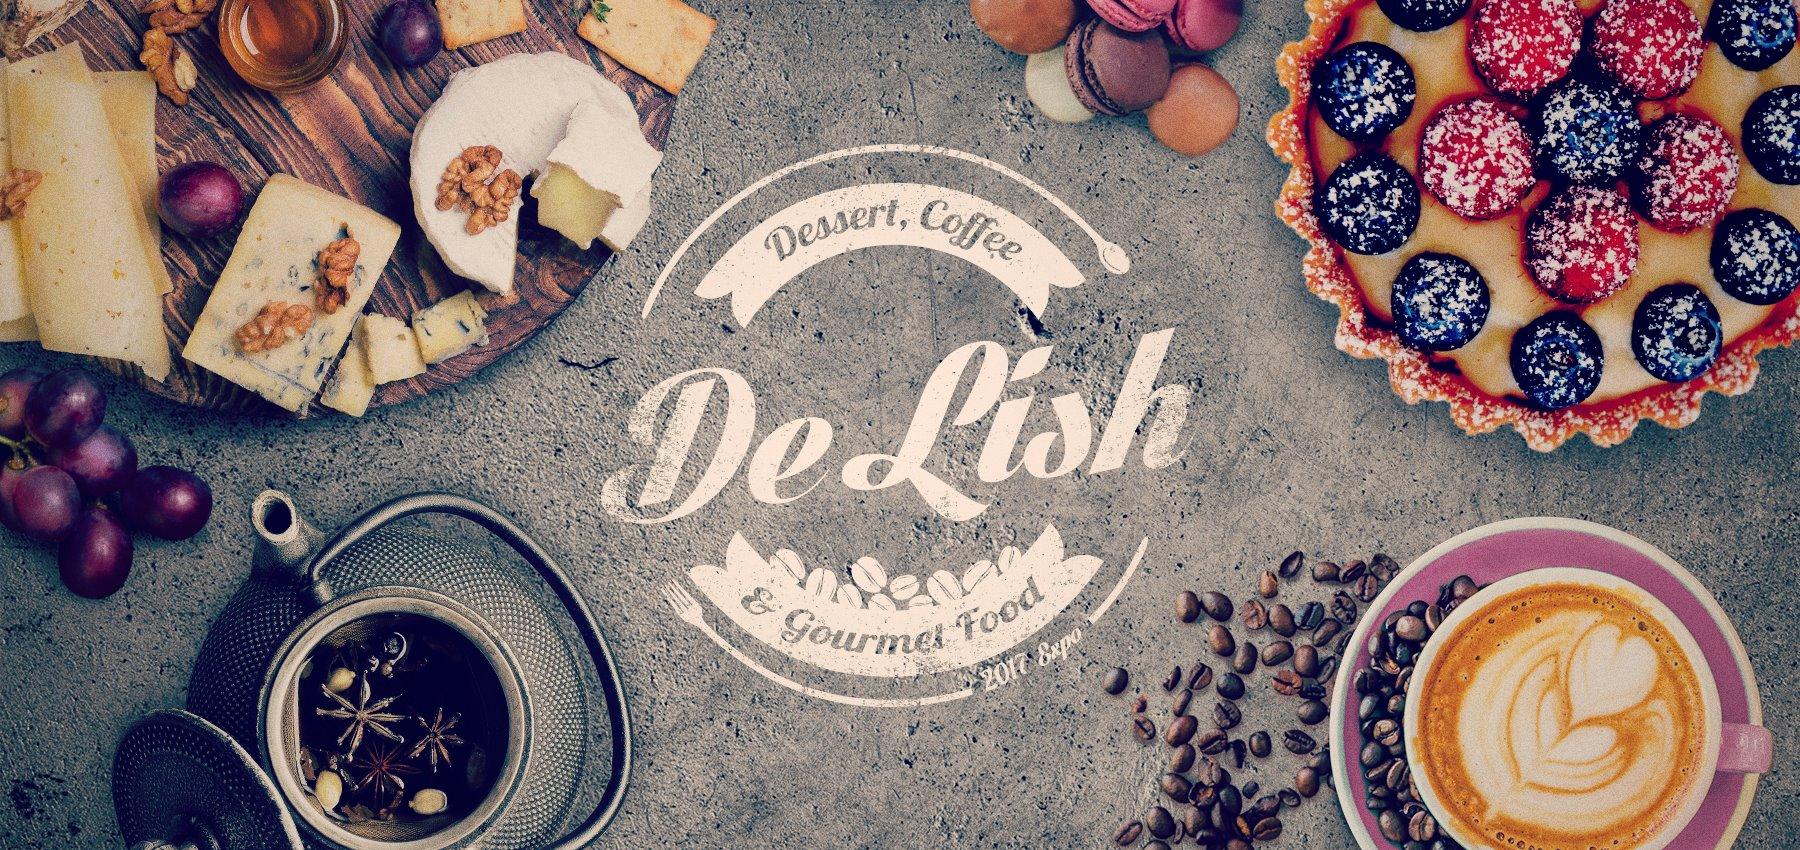 De Lish Dessert, Coffee and Gourmet Food Expo on this Sunday